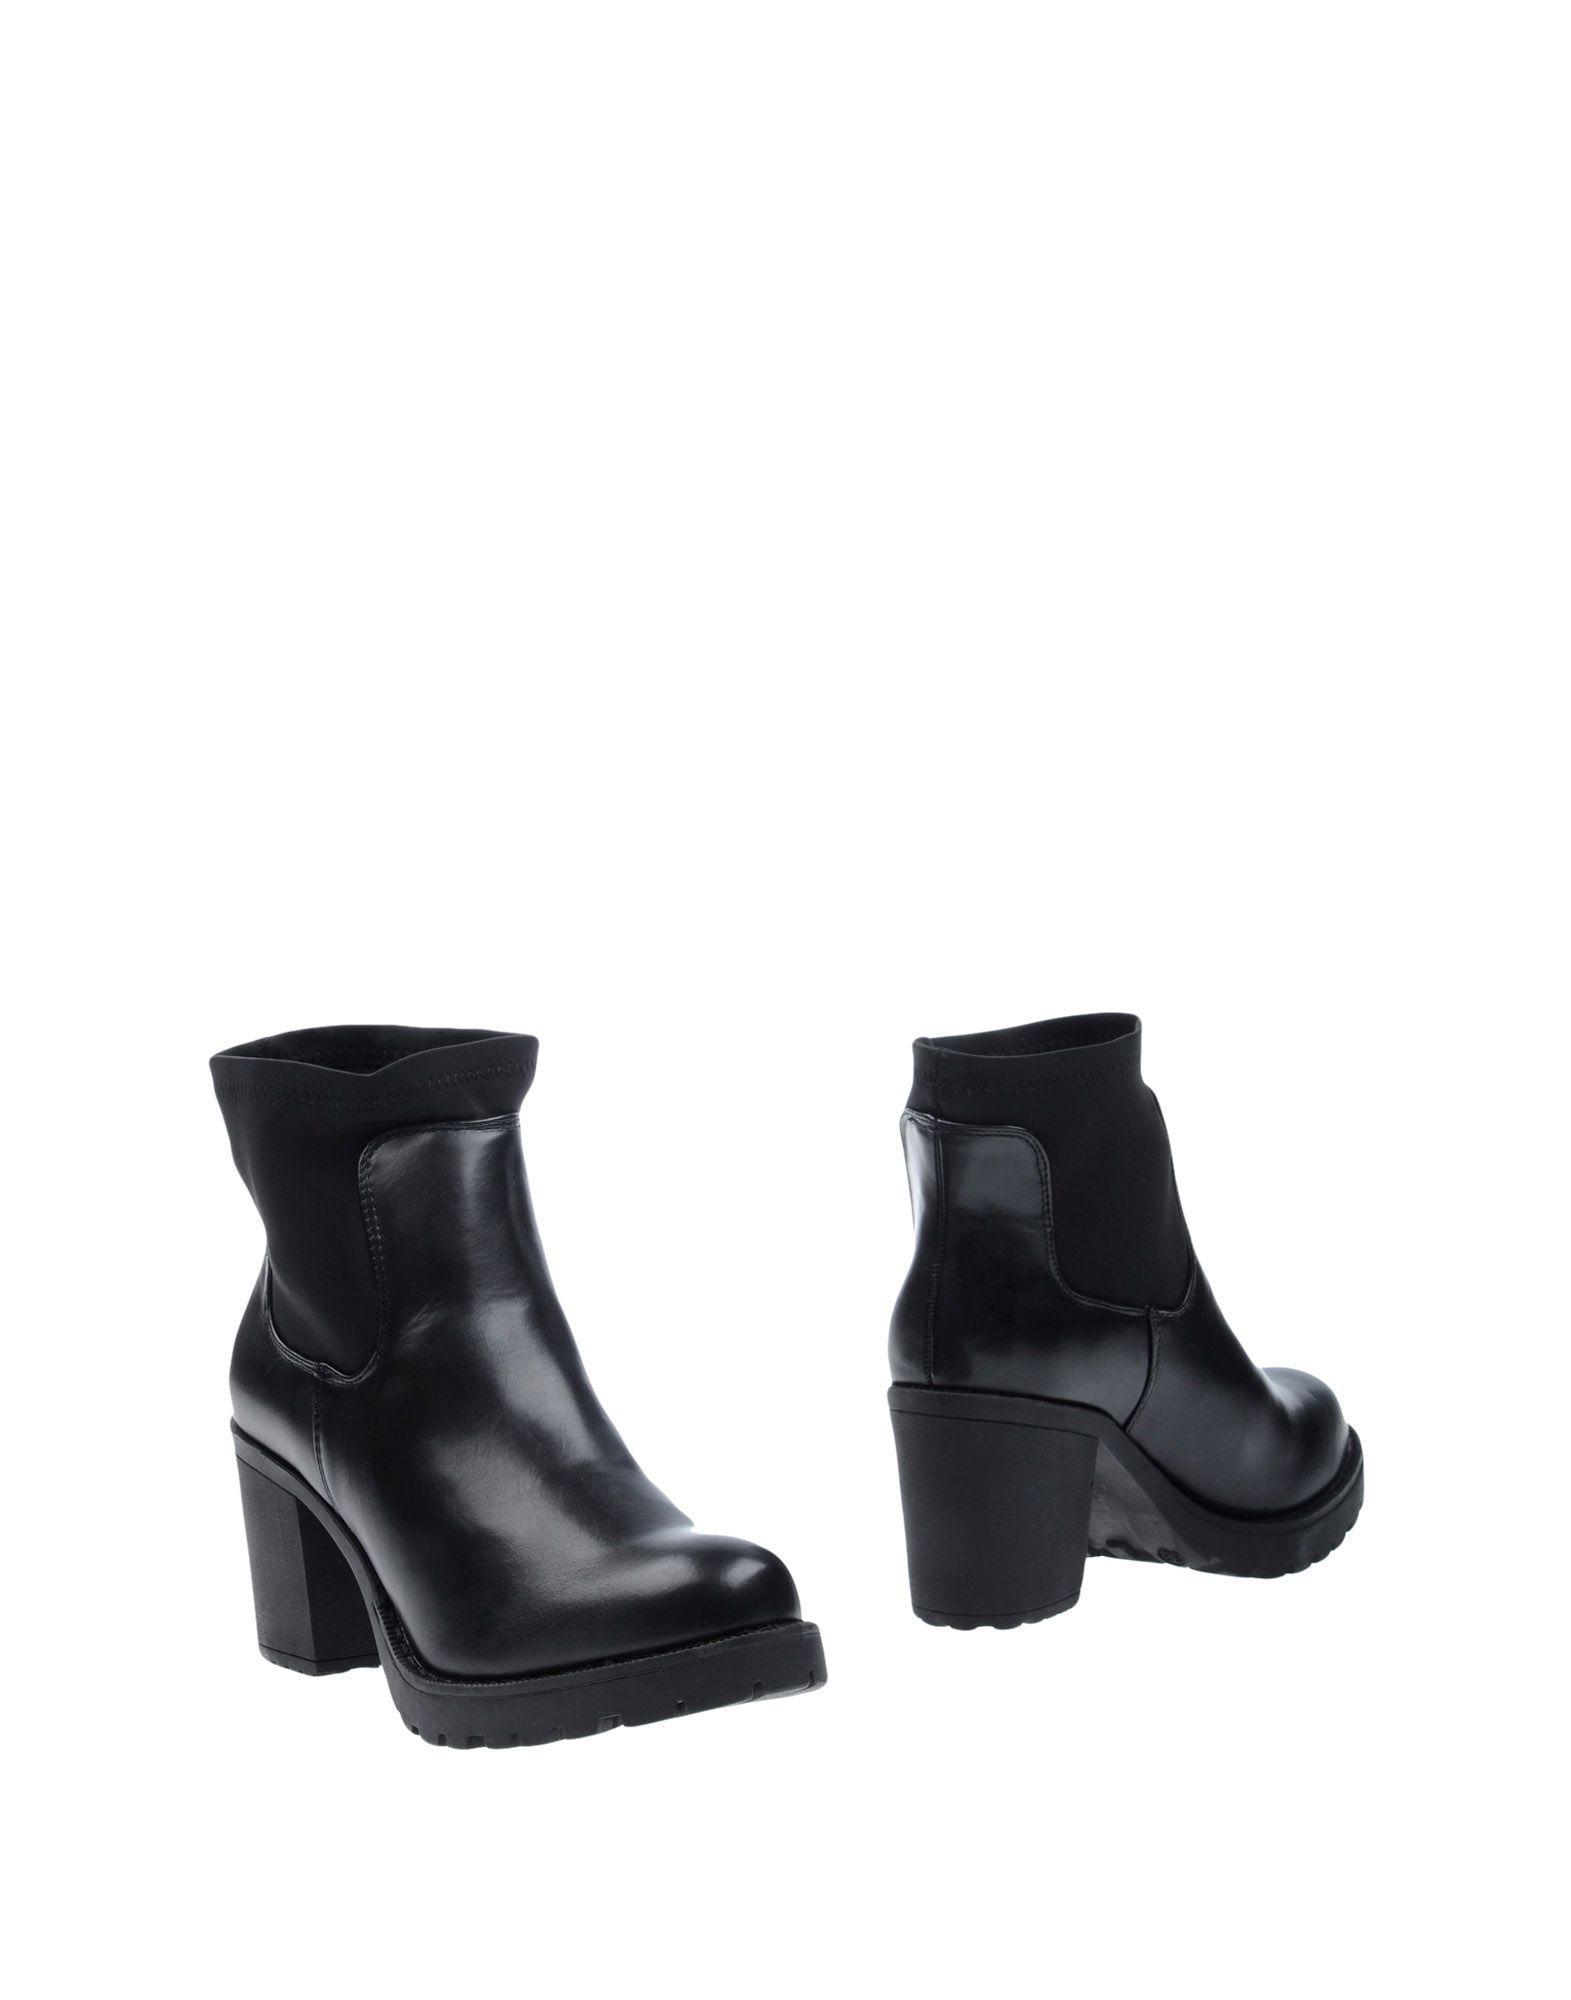 Stellaberg Ankle Boot - Women on Stellaberg Ankle Boots online on Women  Australia - 11258778LQ 44f203